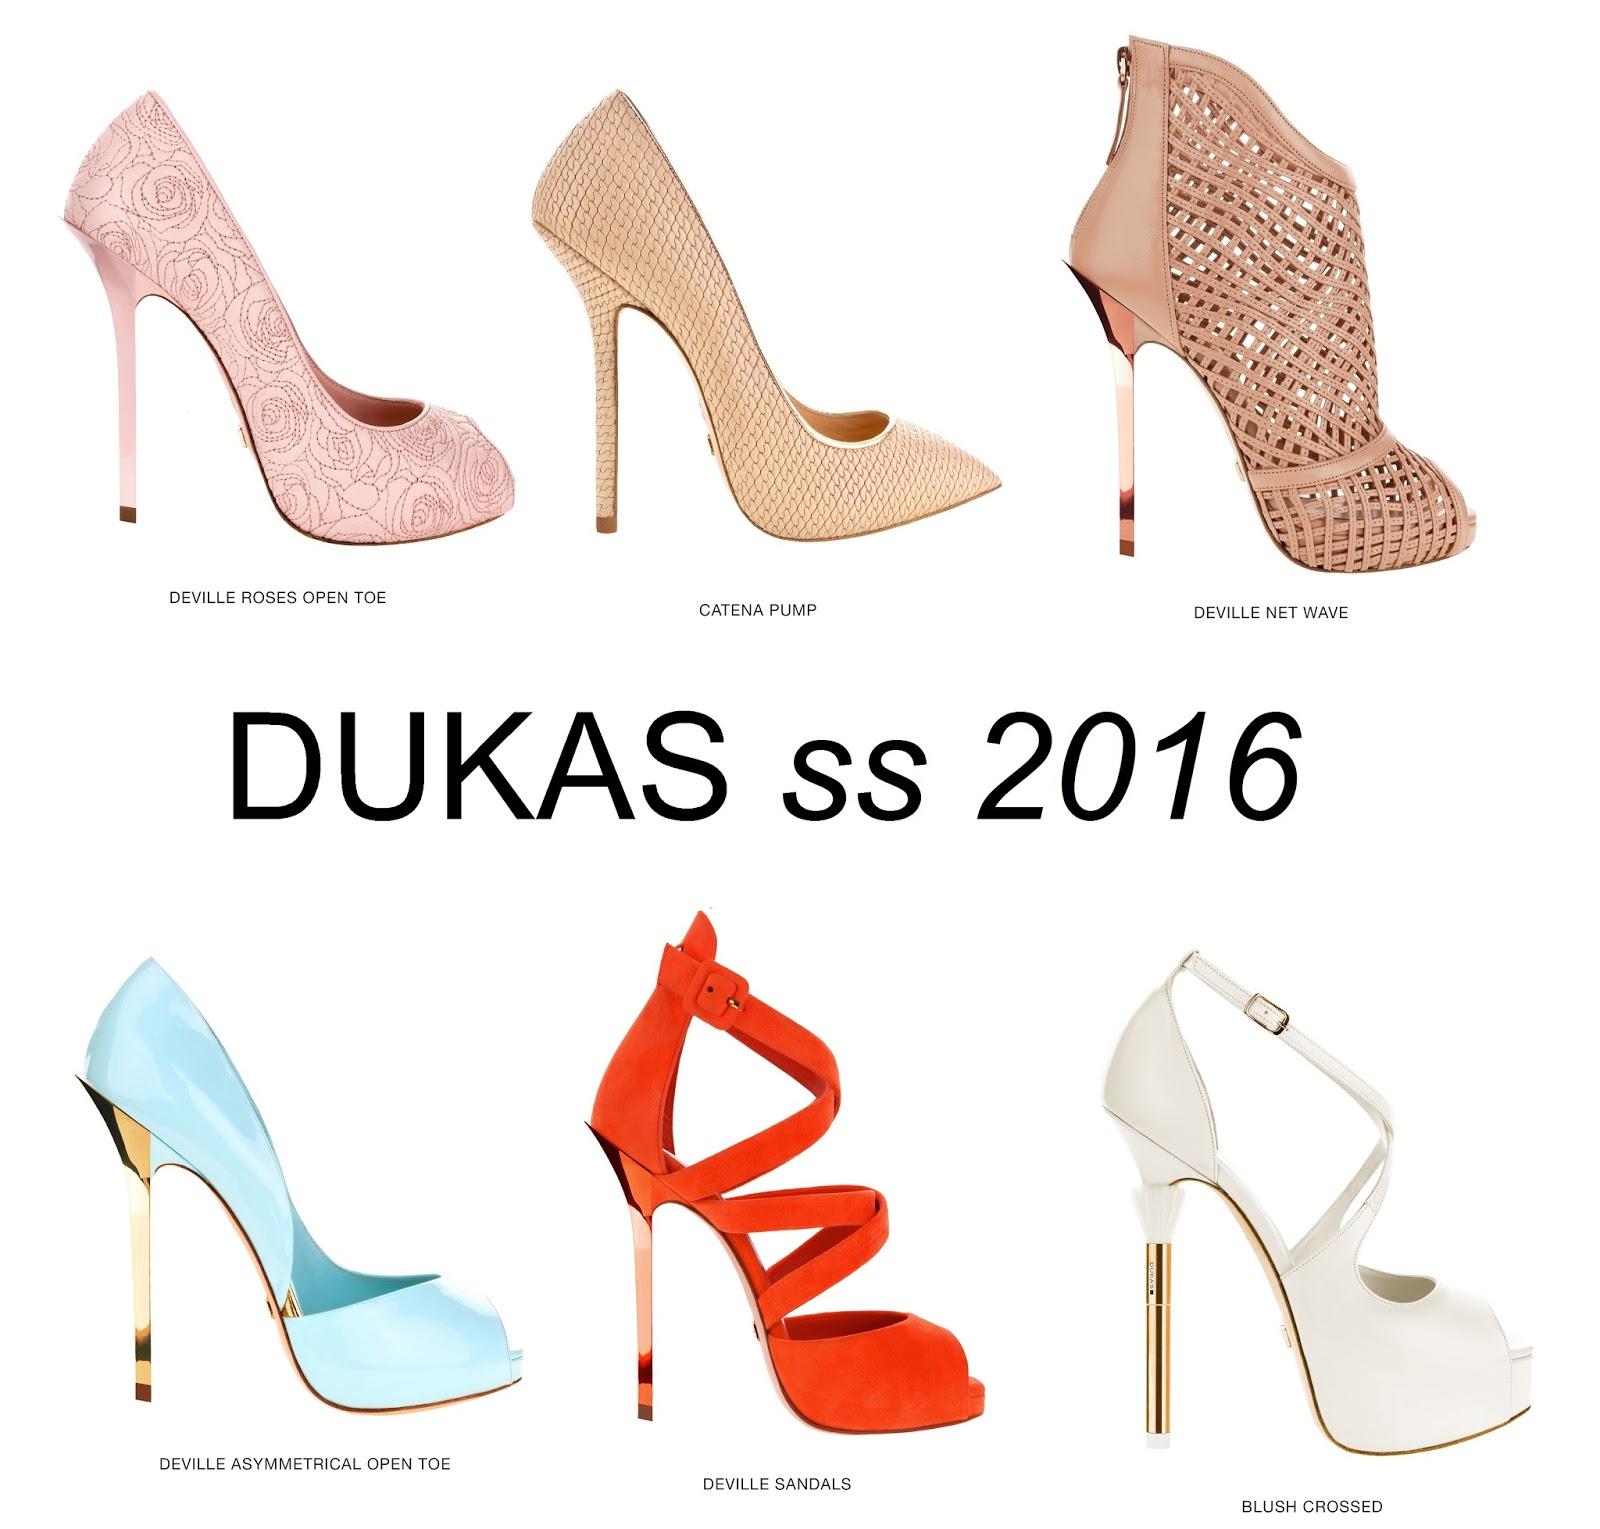 7de4f67d52 DUKAS Άνοιξη Καλοκαίρι 2016. Η νέα συλλογή παπουτσιών του Δούκα Χατζηδούκα